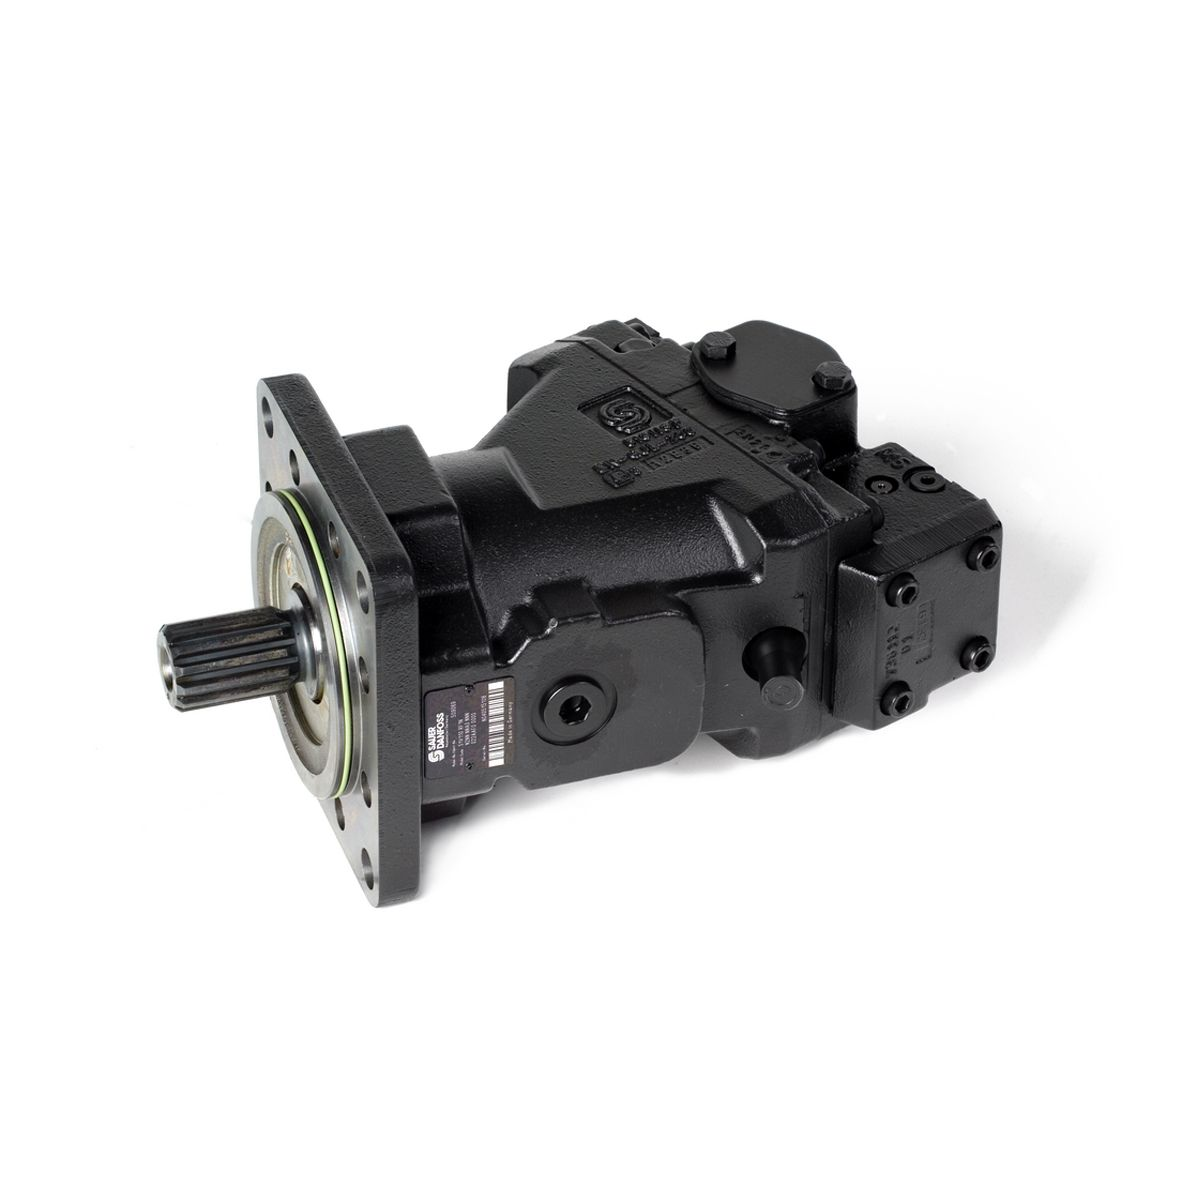 Motor hidráulico de pistones axiales Danfoss